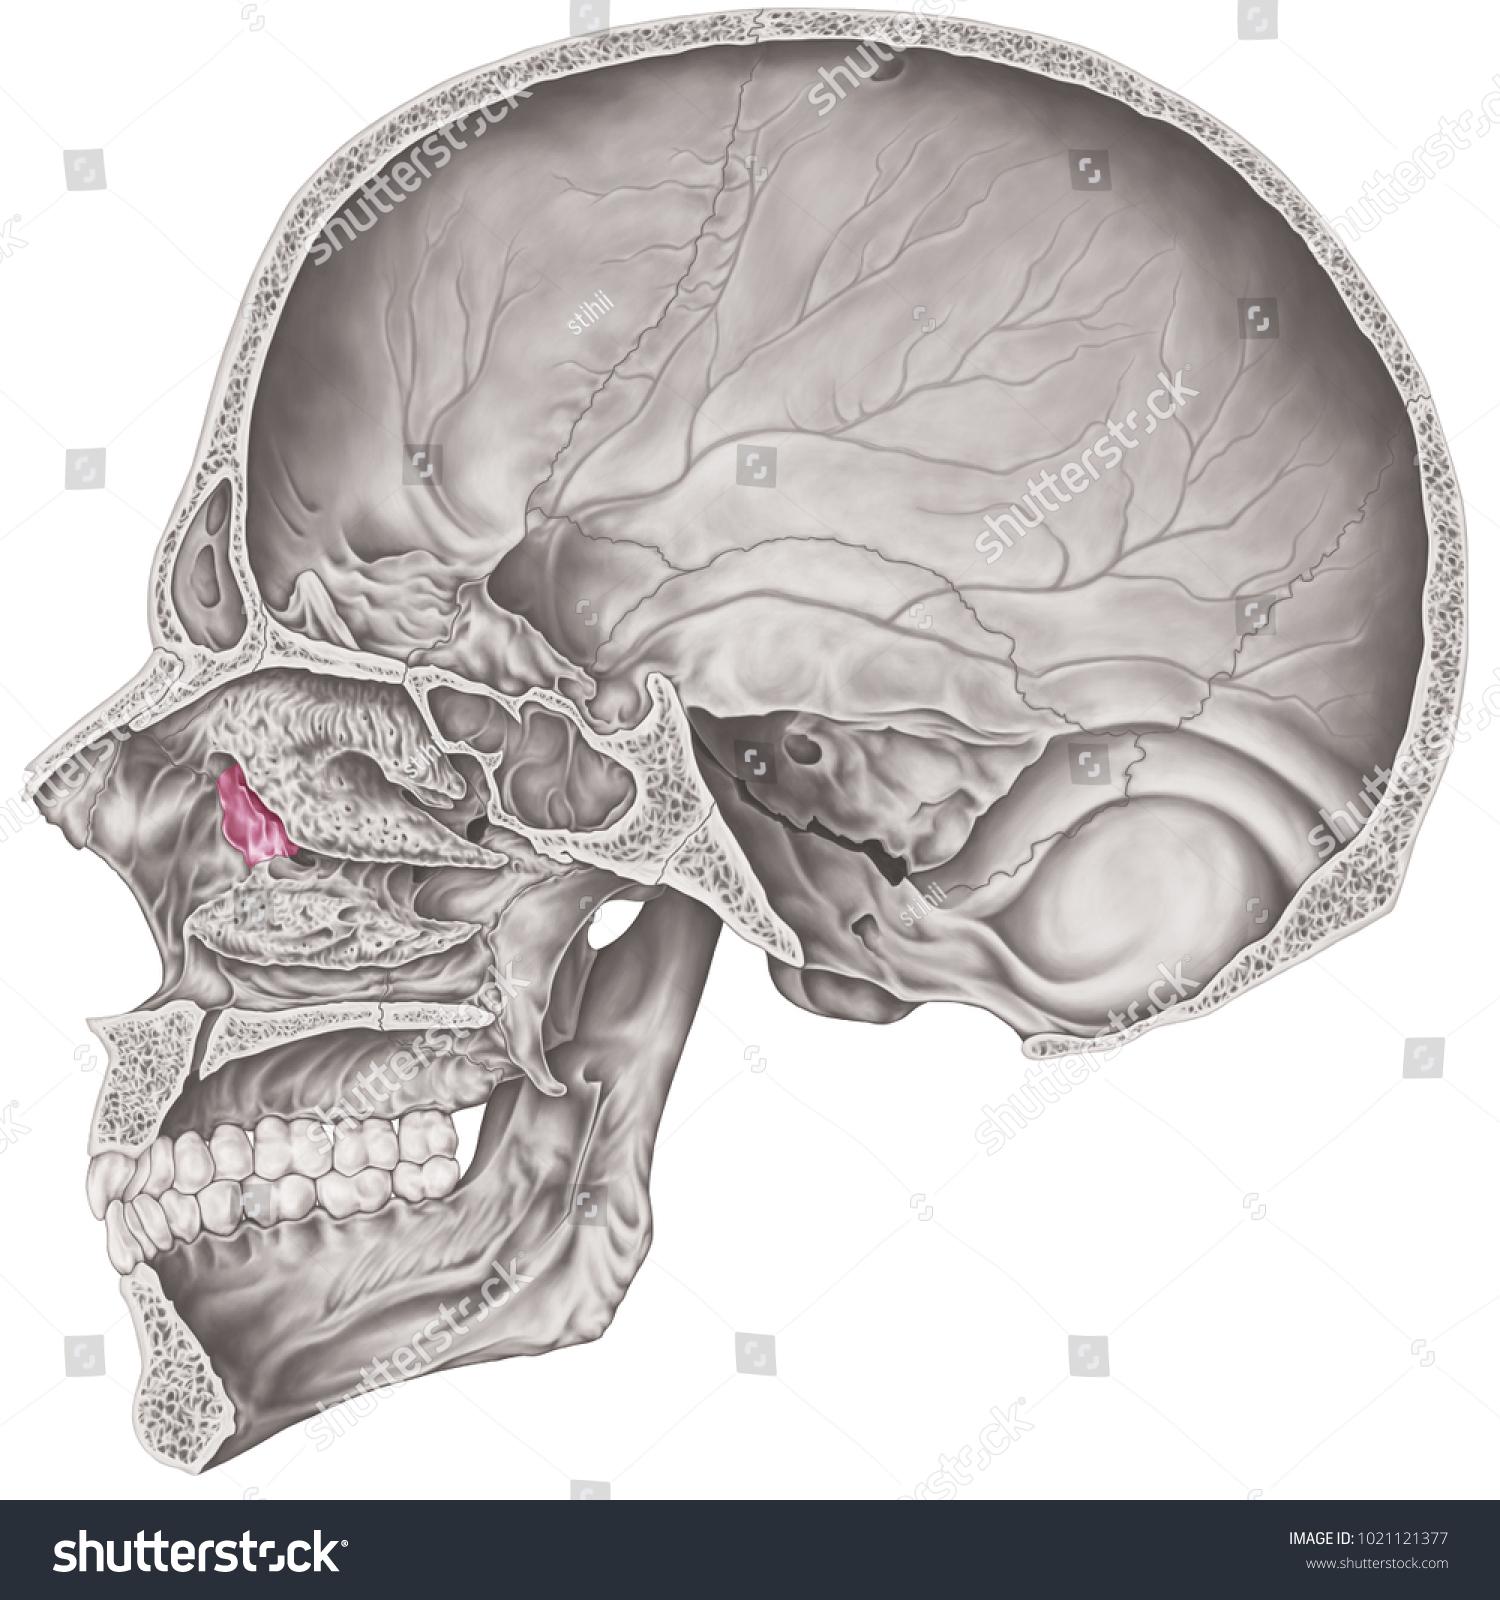 hight resolution of the lacrimal bone of the cranium the bones of the head